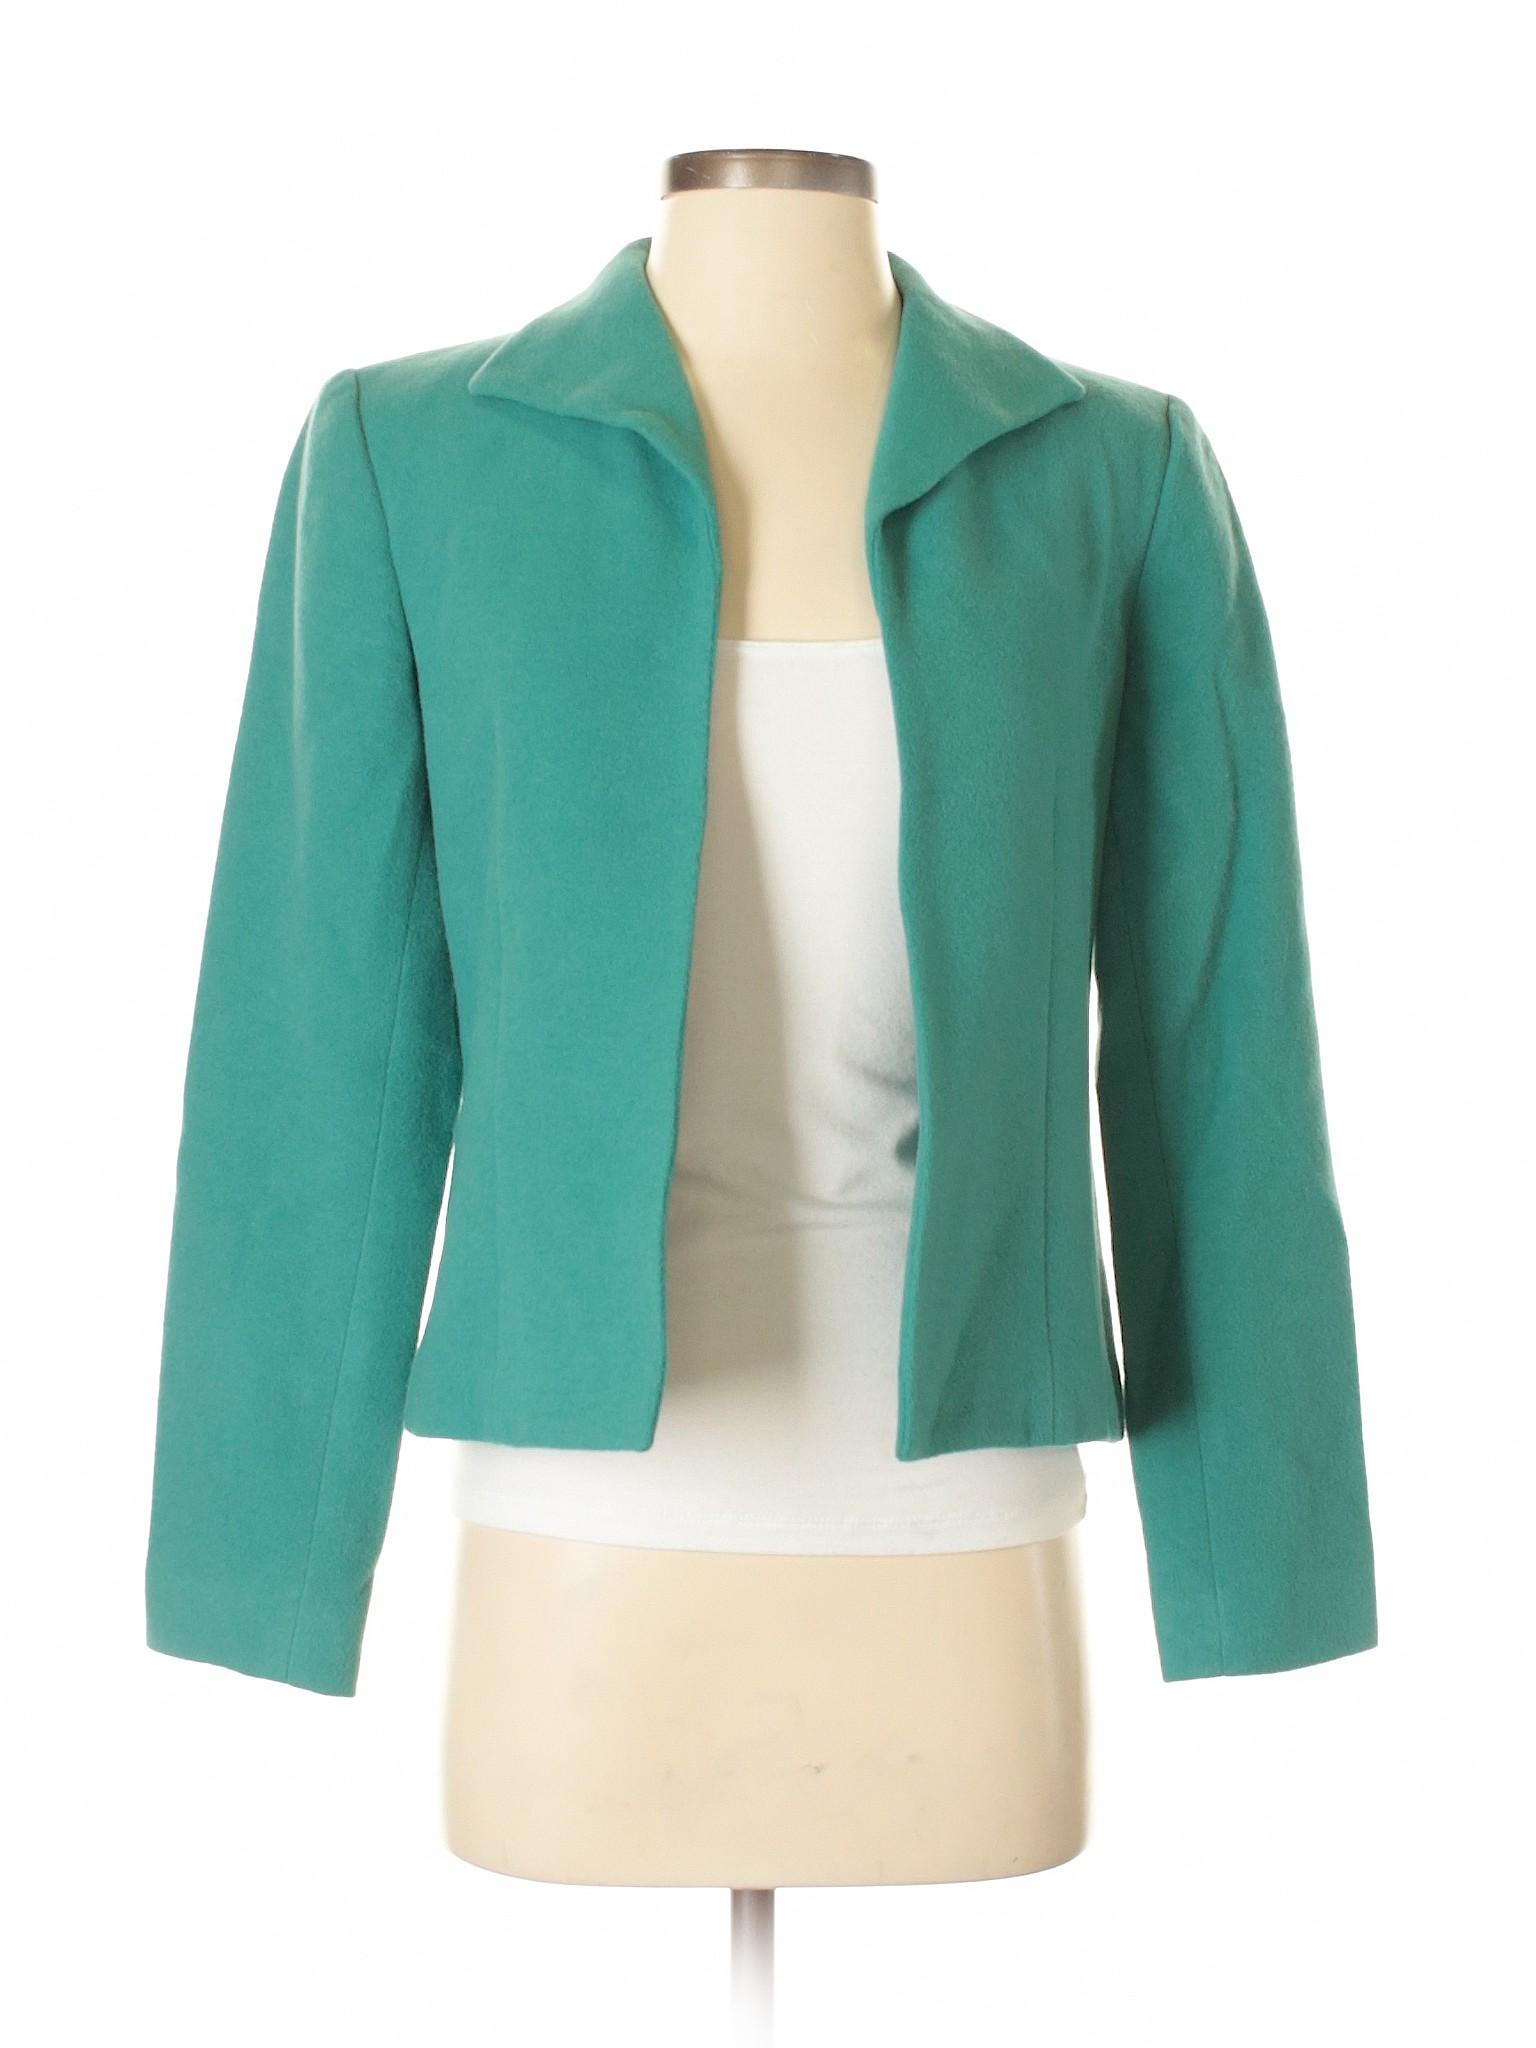 J leisure Hook Wool Blazer G Boutique 5PwqT7Zw